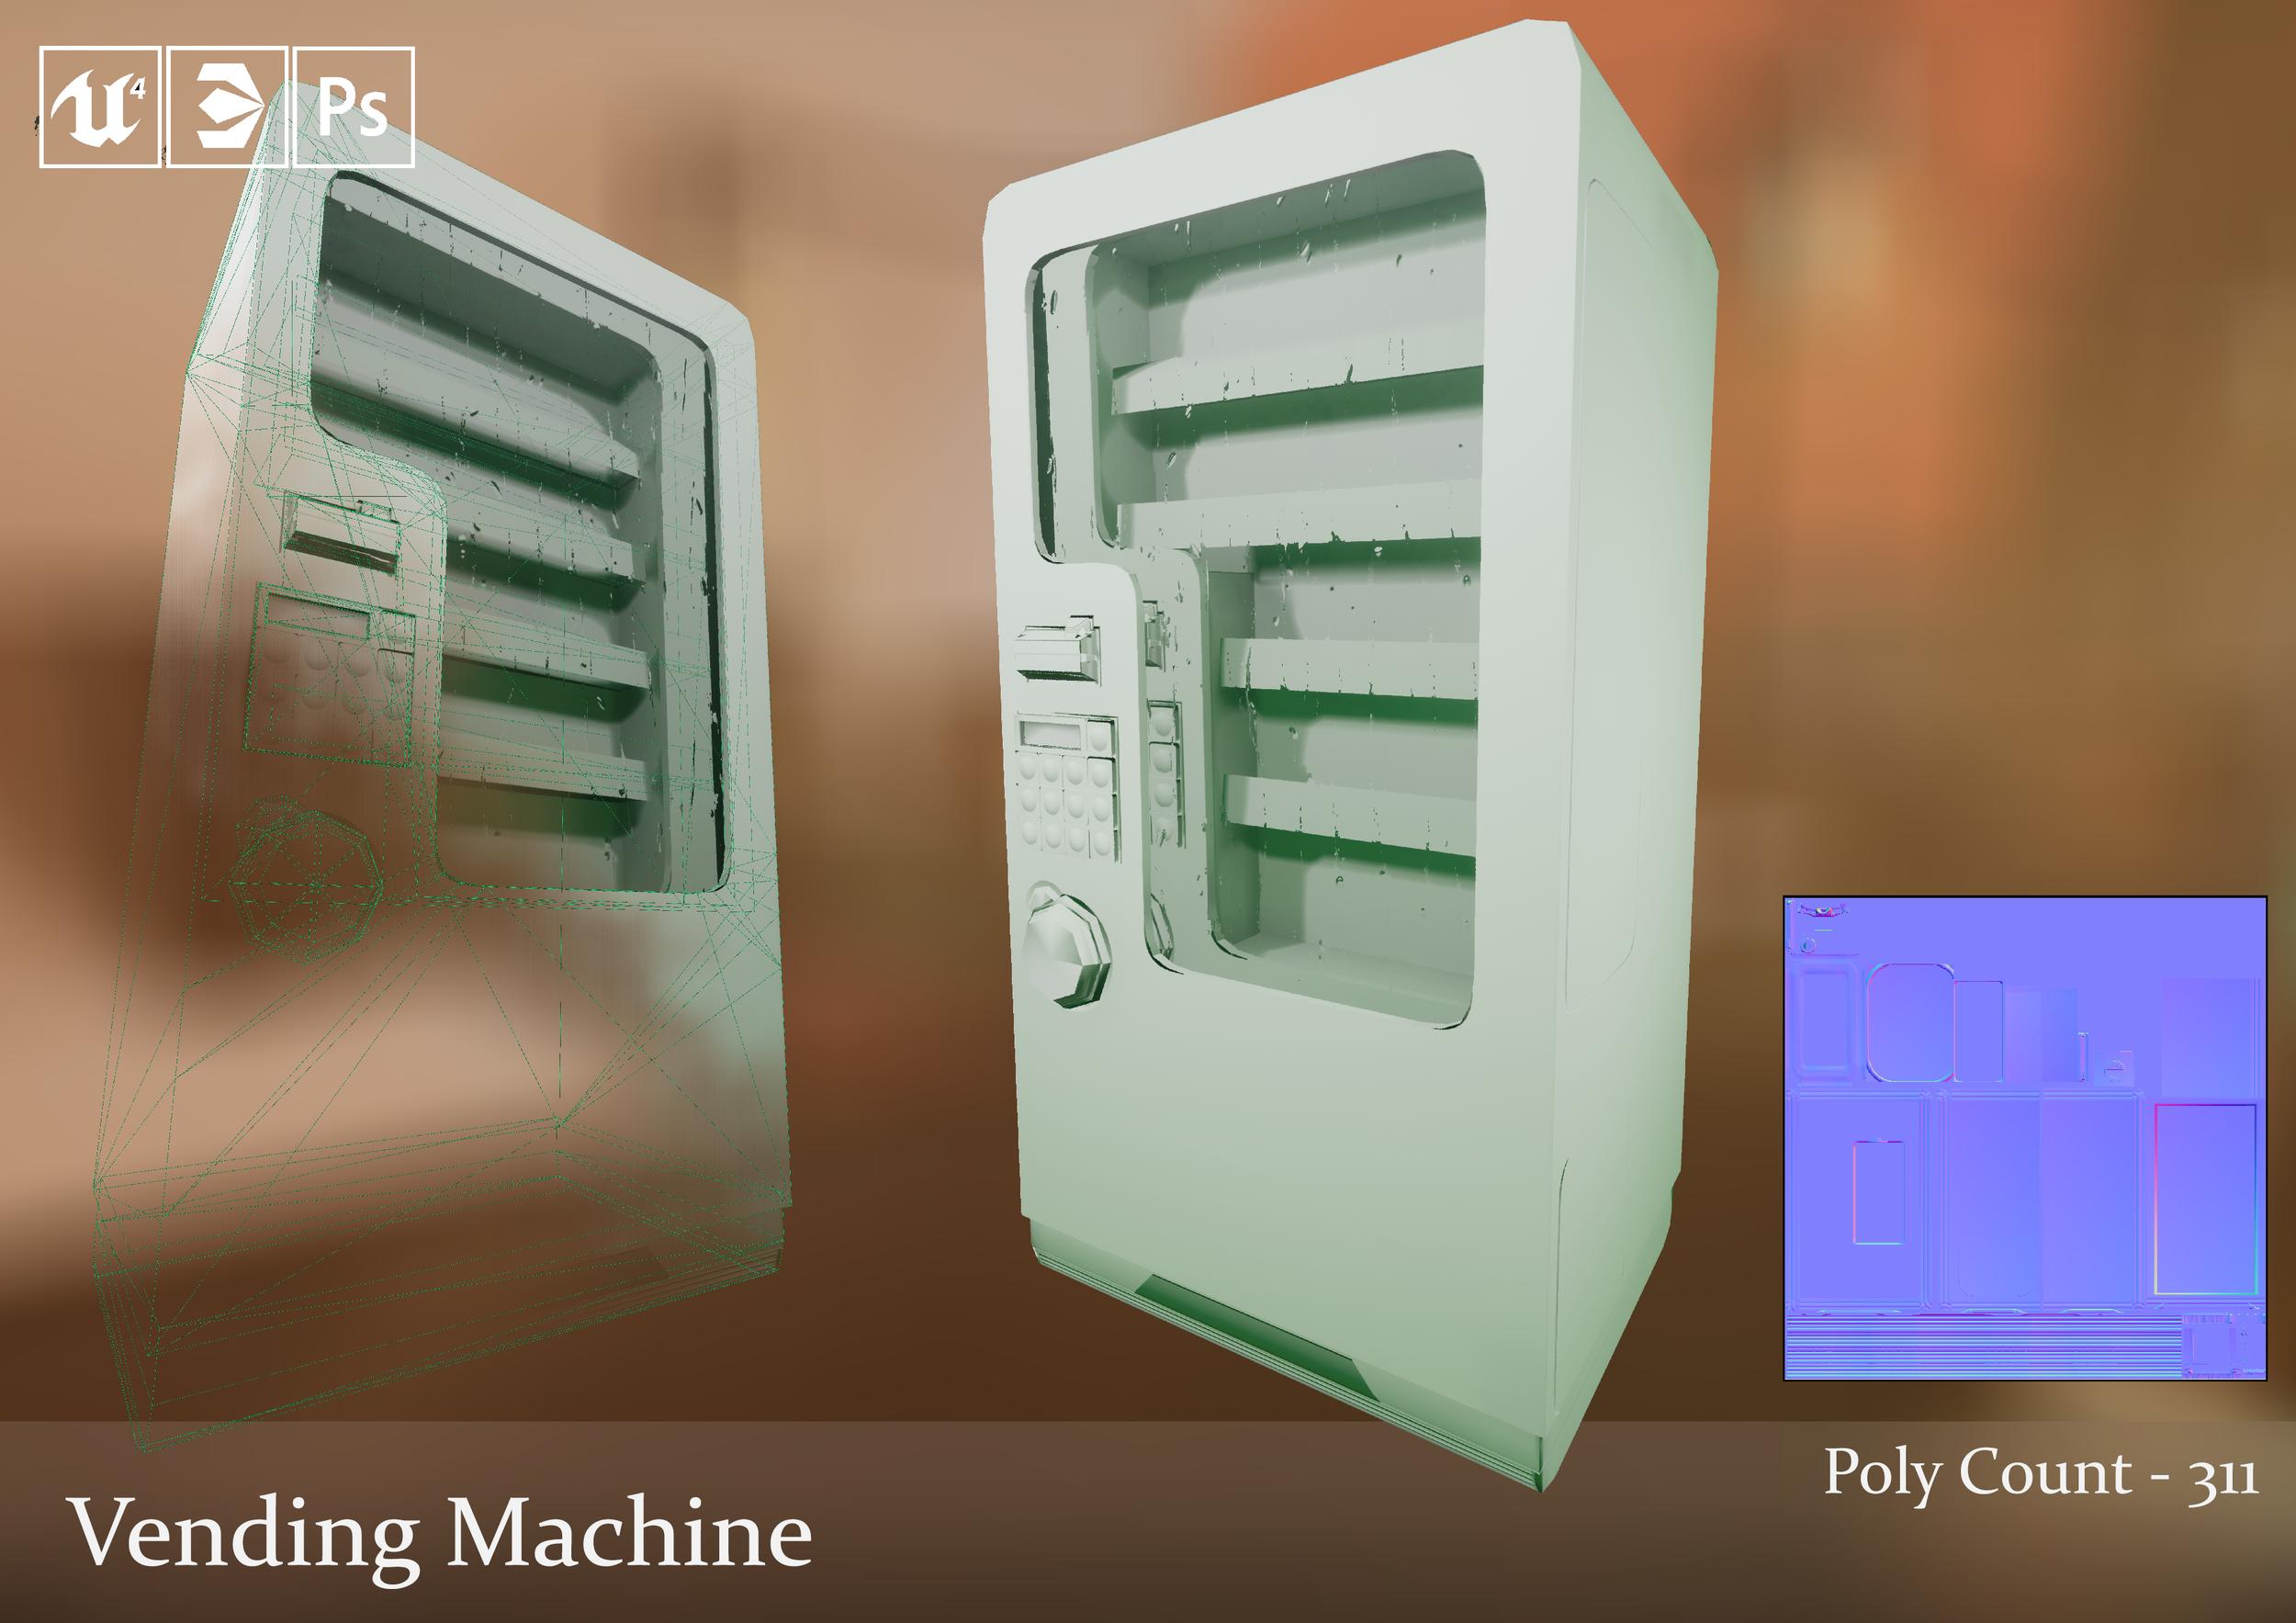 Page 13 - VendingMachine.png